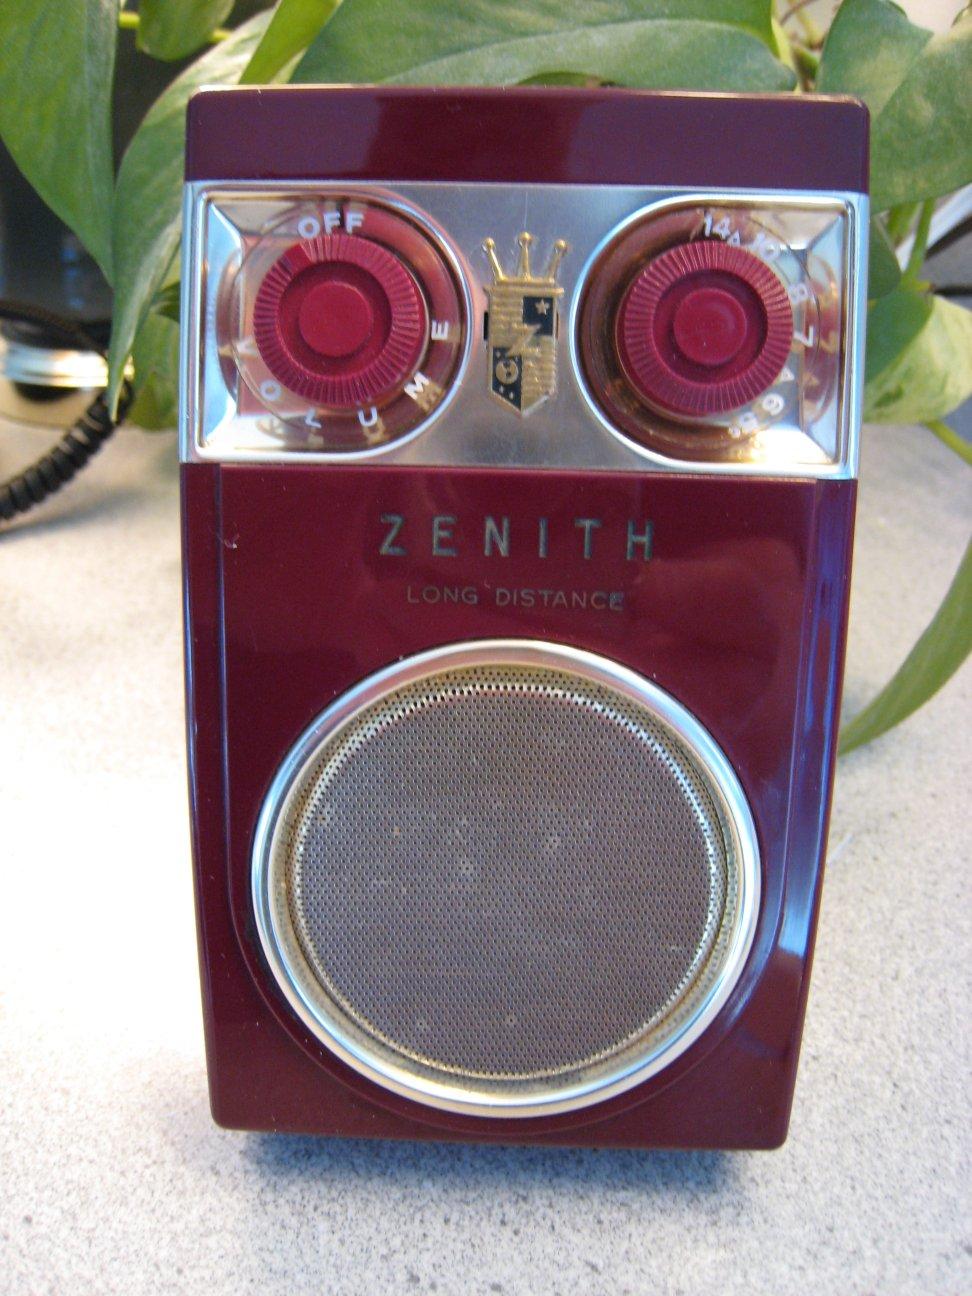 Zenith Royal 500 Series Transistor Radios  The Owl Eye